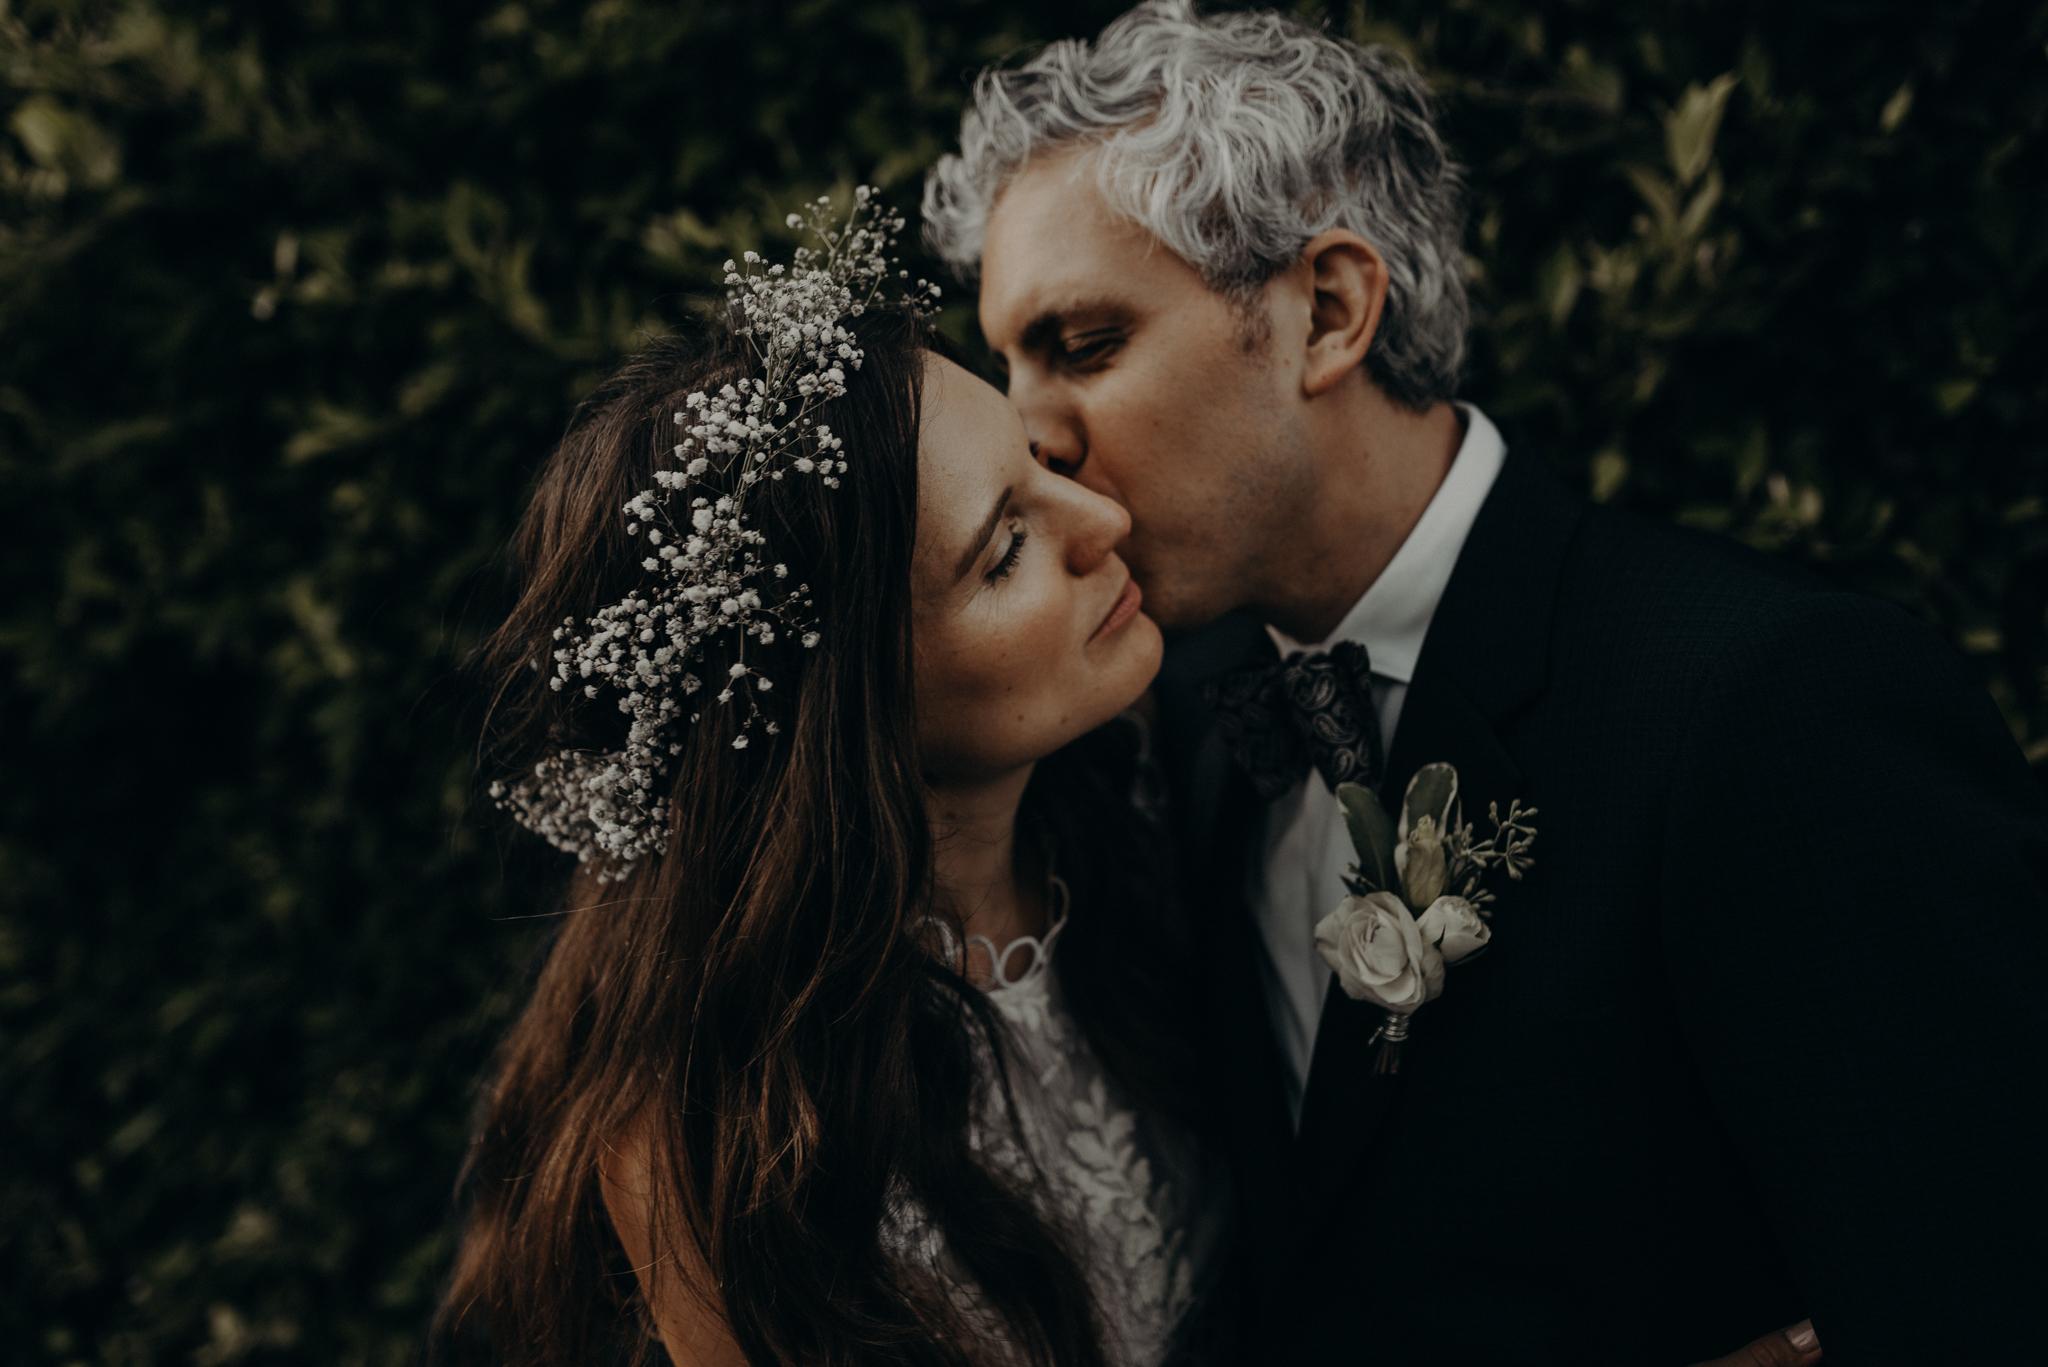 Isaiah + Taylor Photography - Private Estate Backyard Wedding - Beverly Hills - Los Angeles Wedding Photographer - 117.jpg